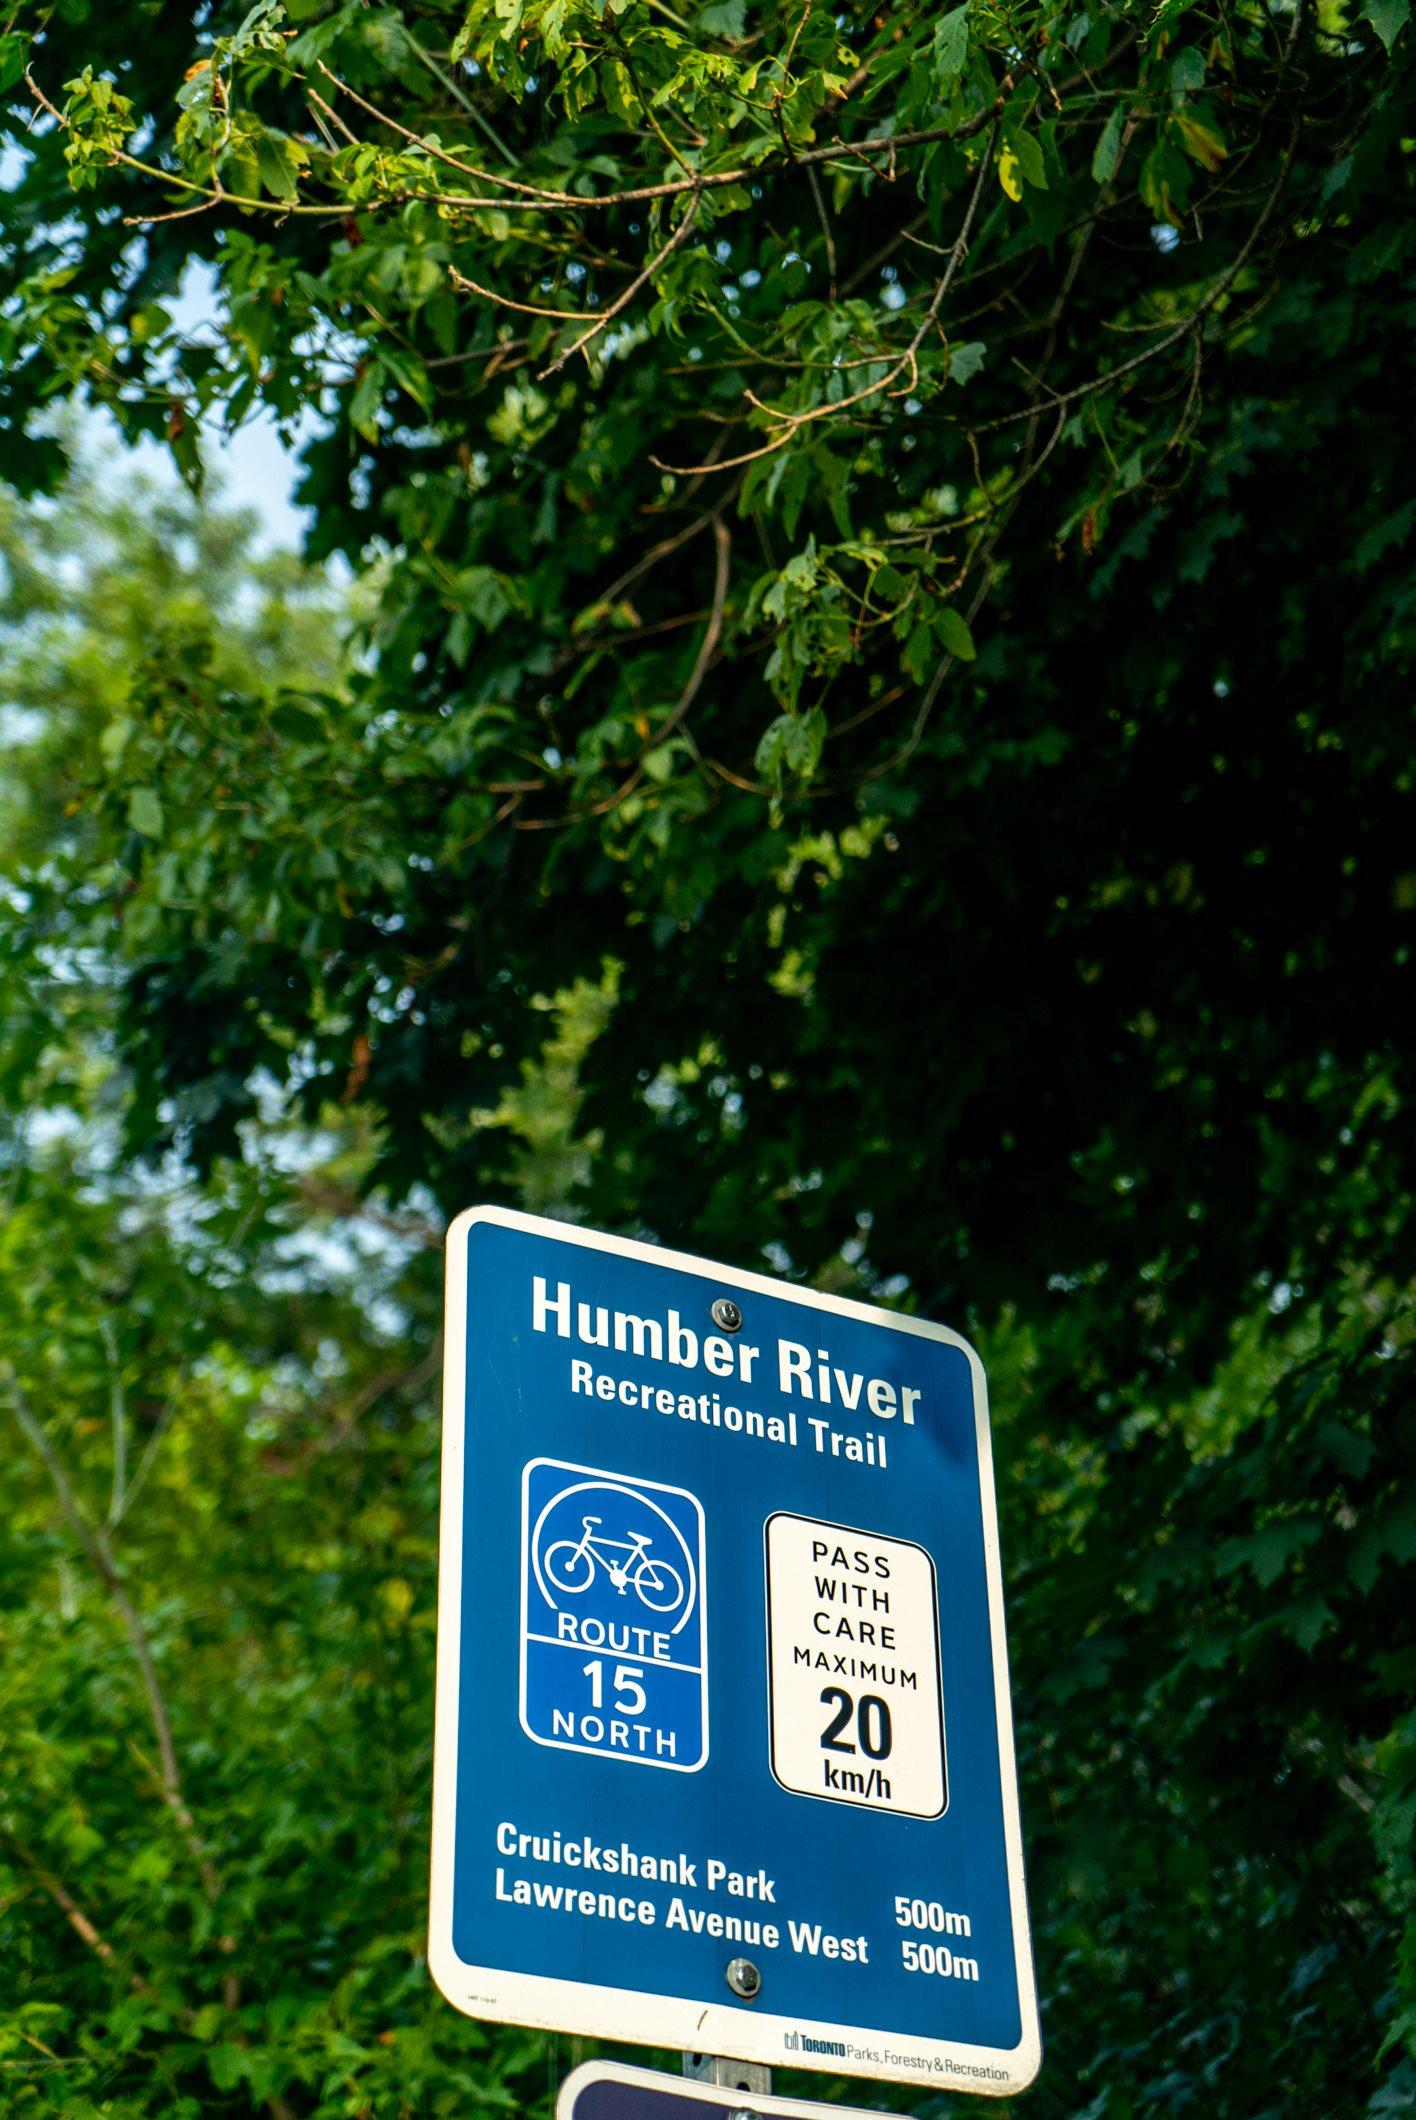 Humber River Recreational Trail